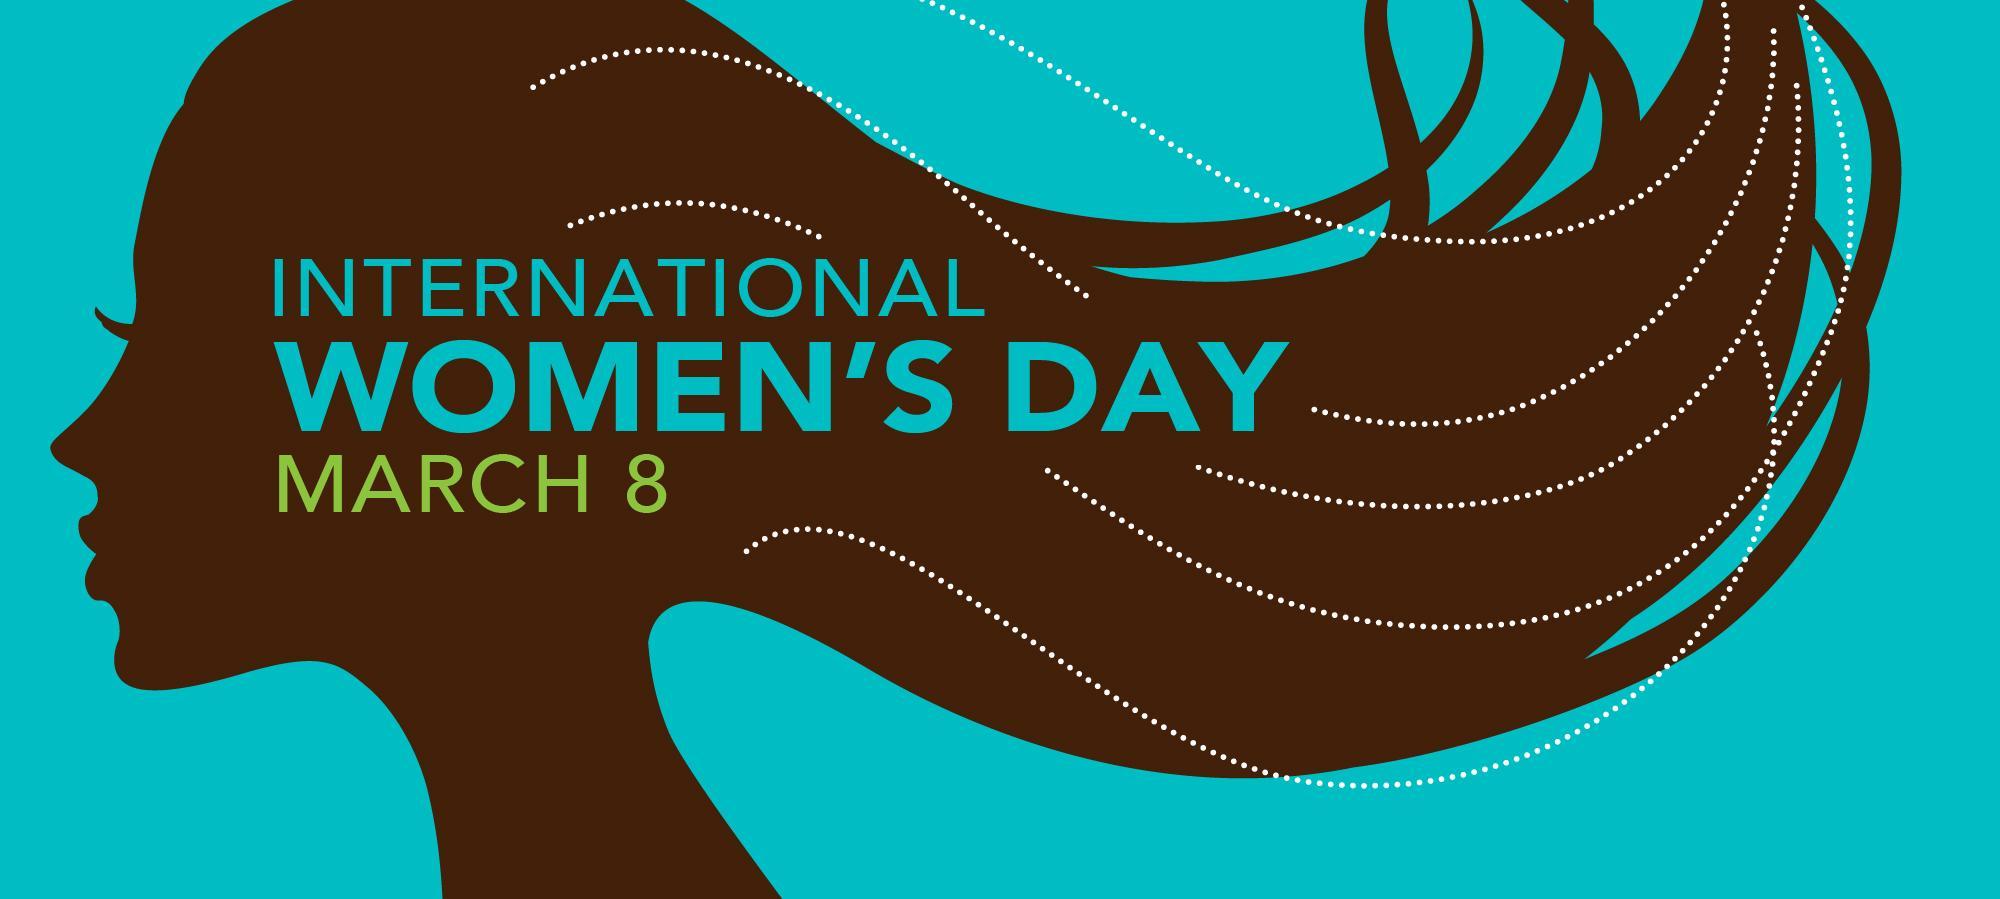 March 8th International Womens Day